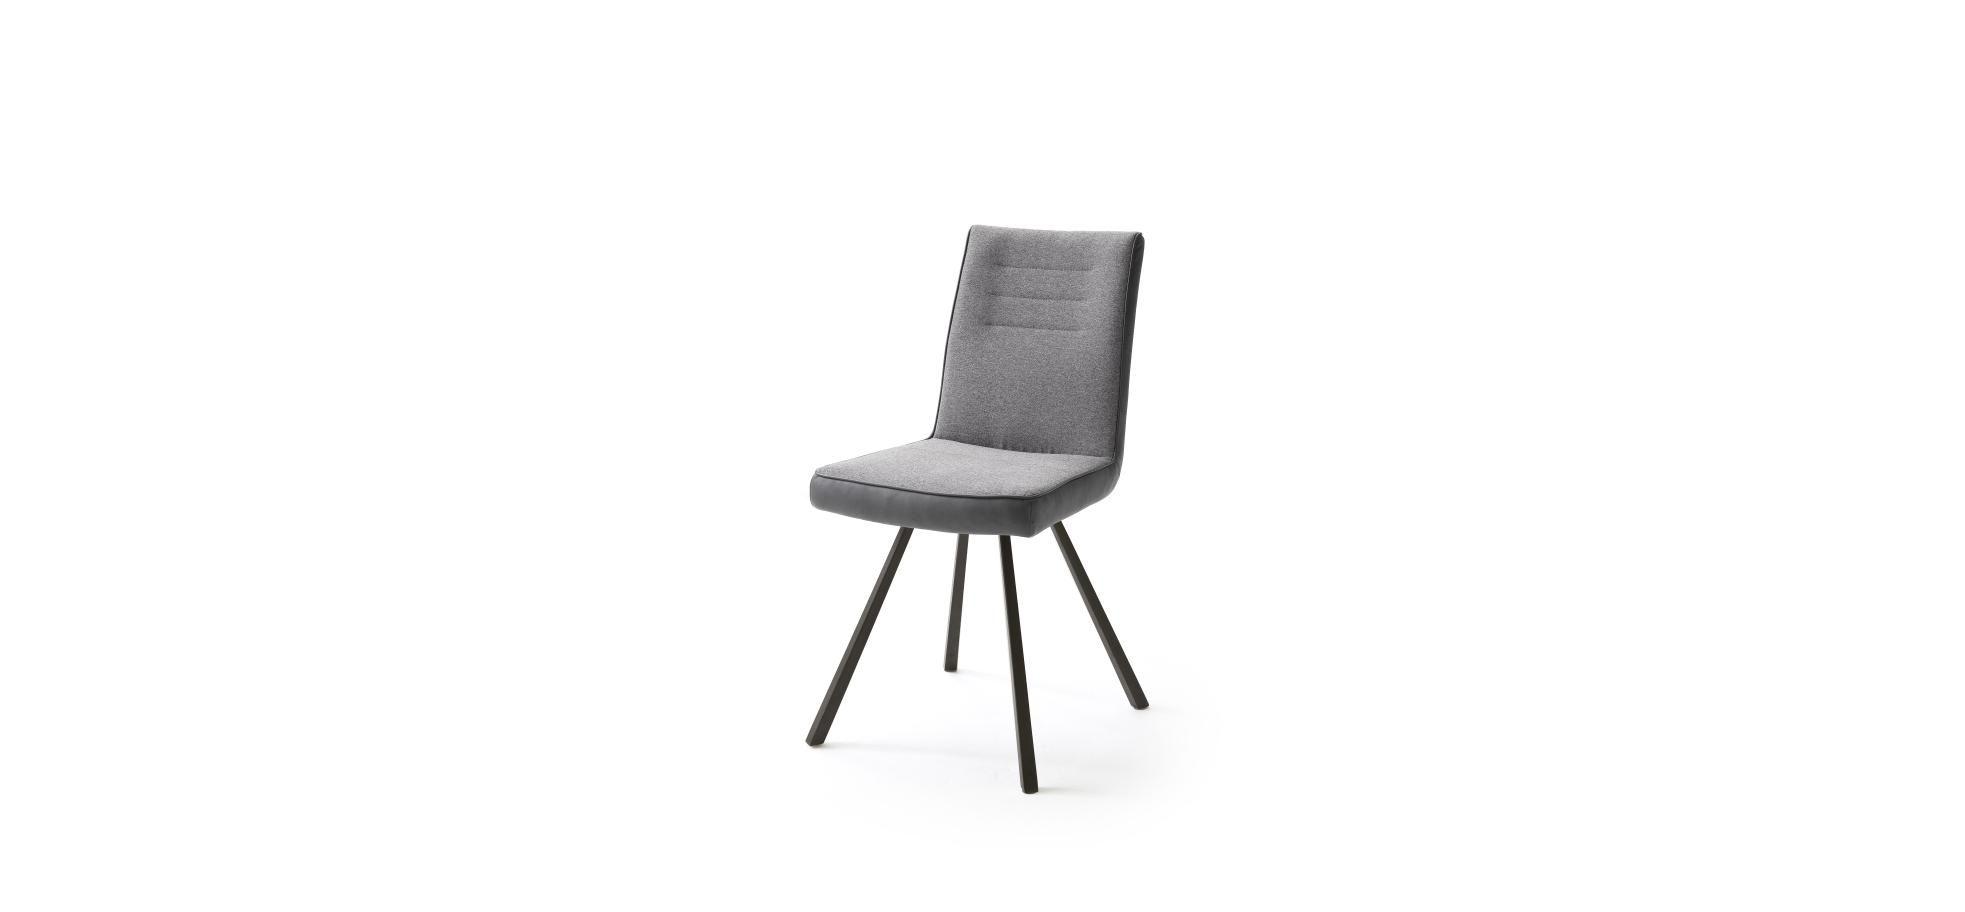 Stuhl In Grau Berkemeier Home Company Möbelstück Schöne Zuhause Stühle